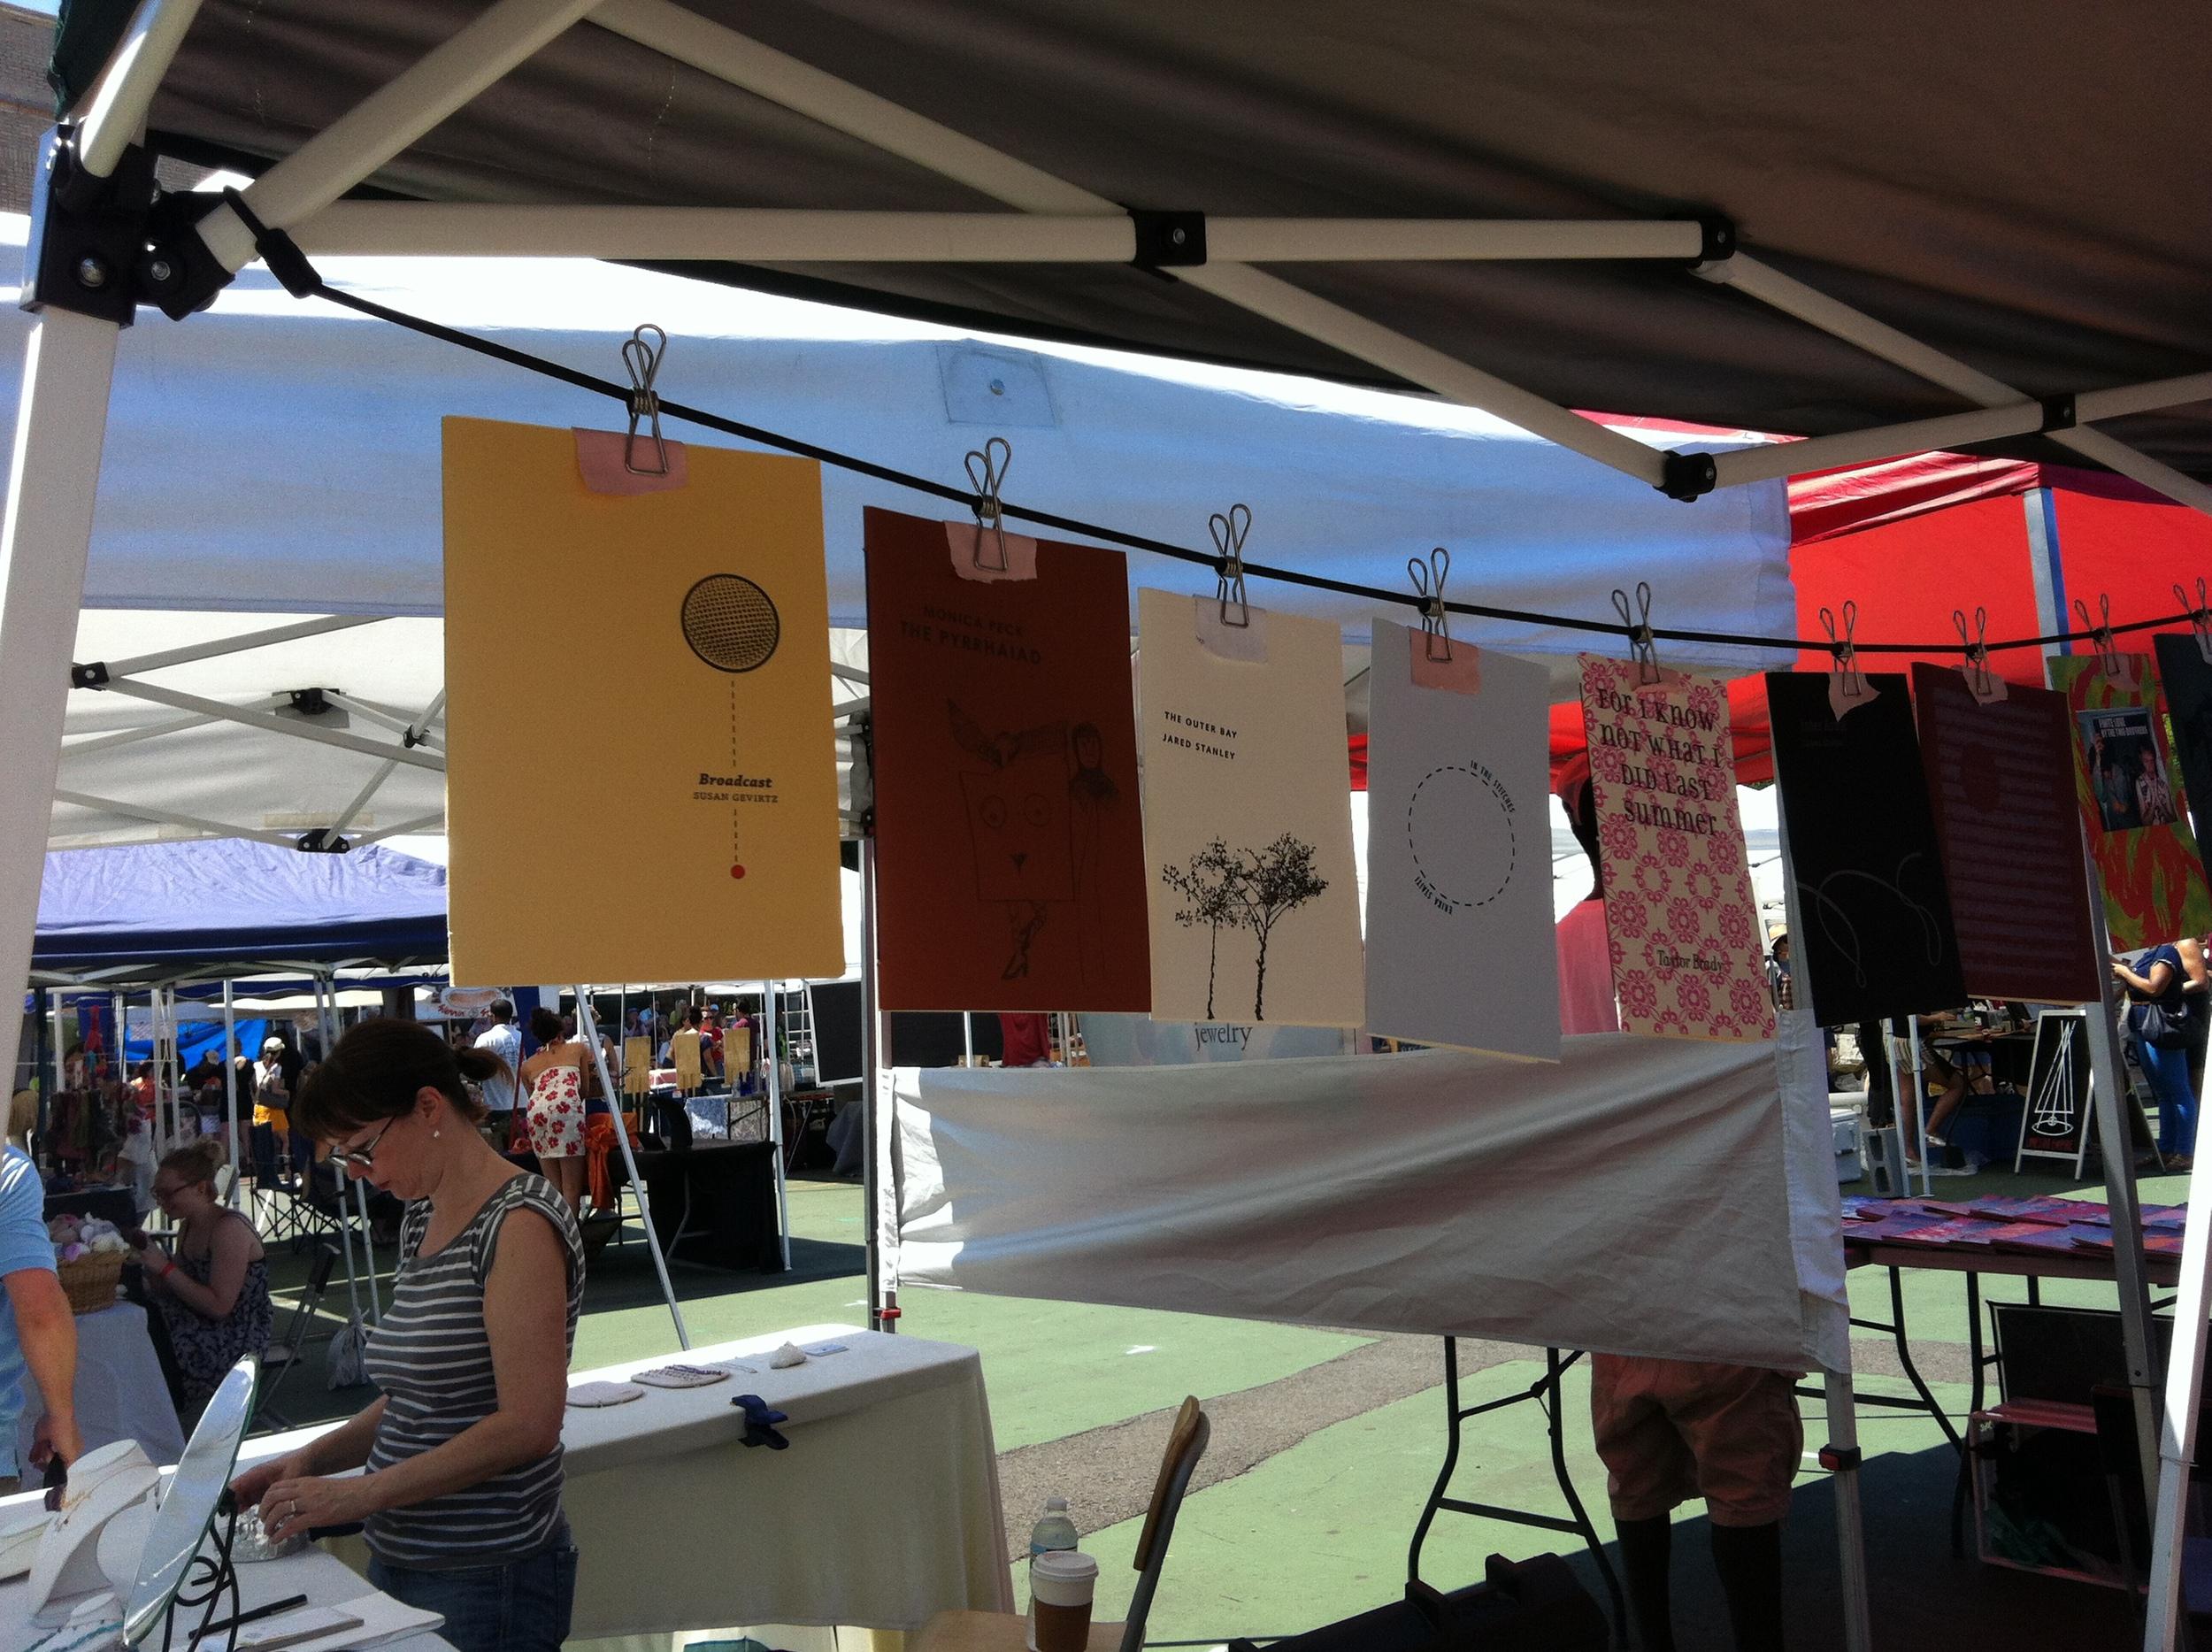 A display of beautiful handprinted chapbooks by Erin Morrill of Trafficker Press